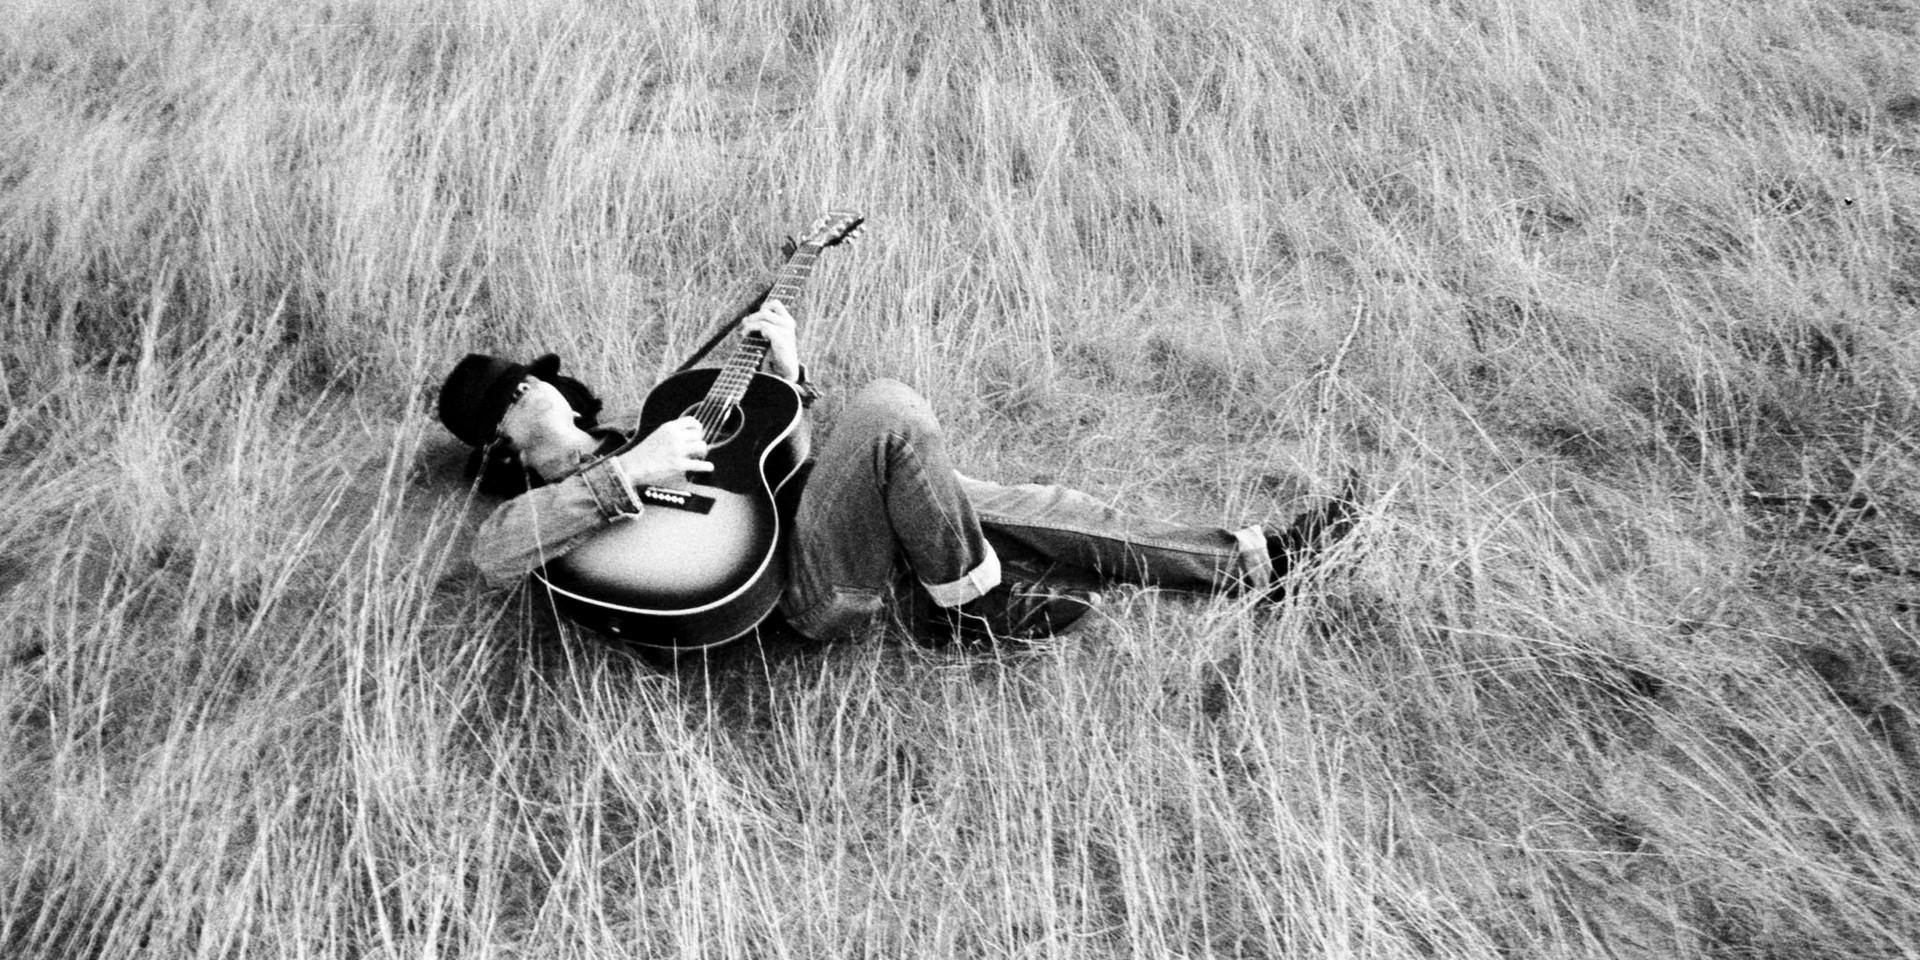 Ian Penn records new single 'Death of a Traveller' in a church – listen